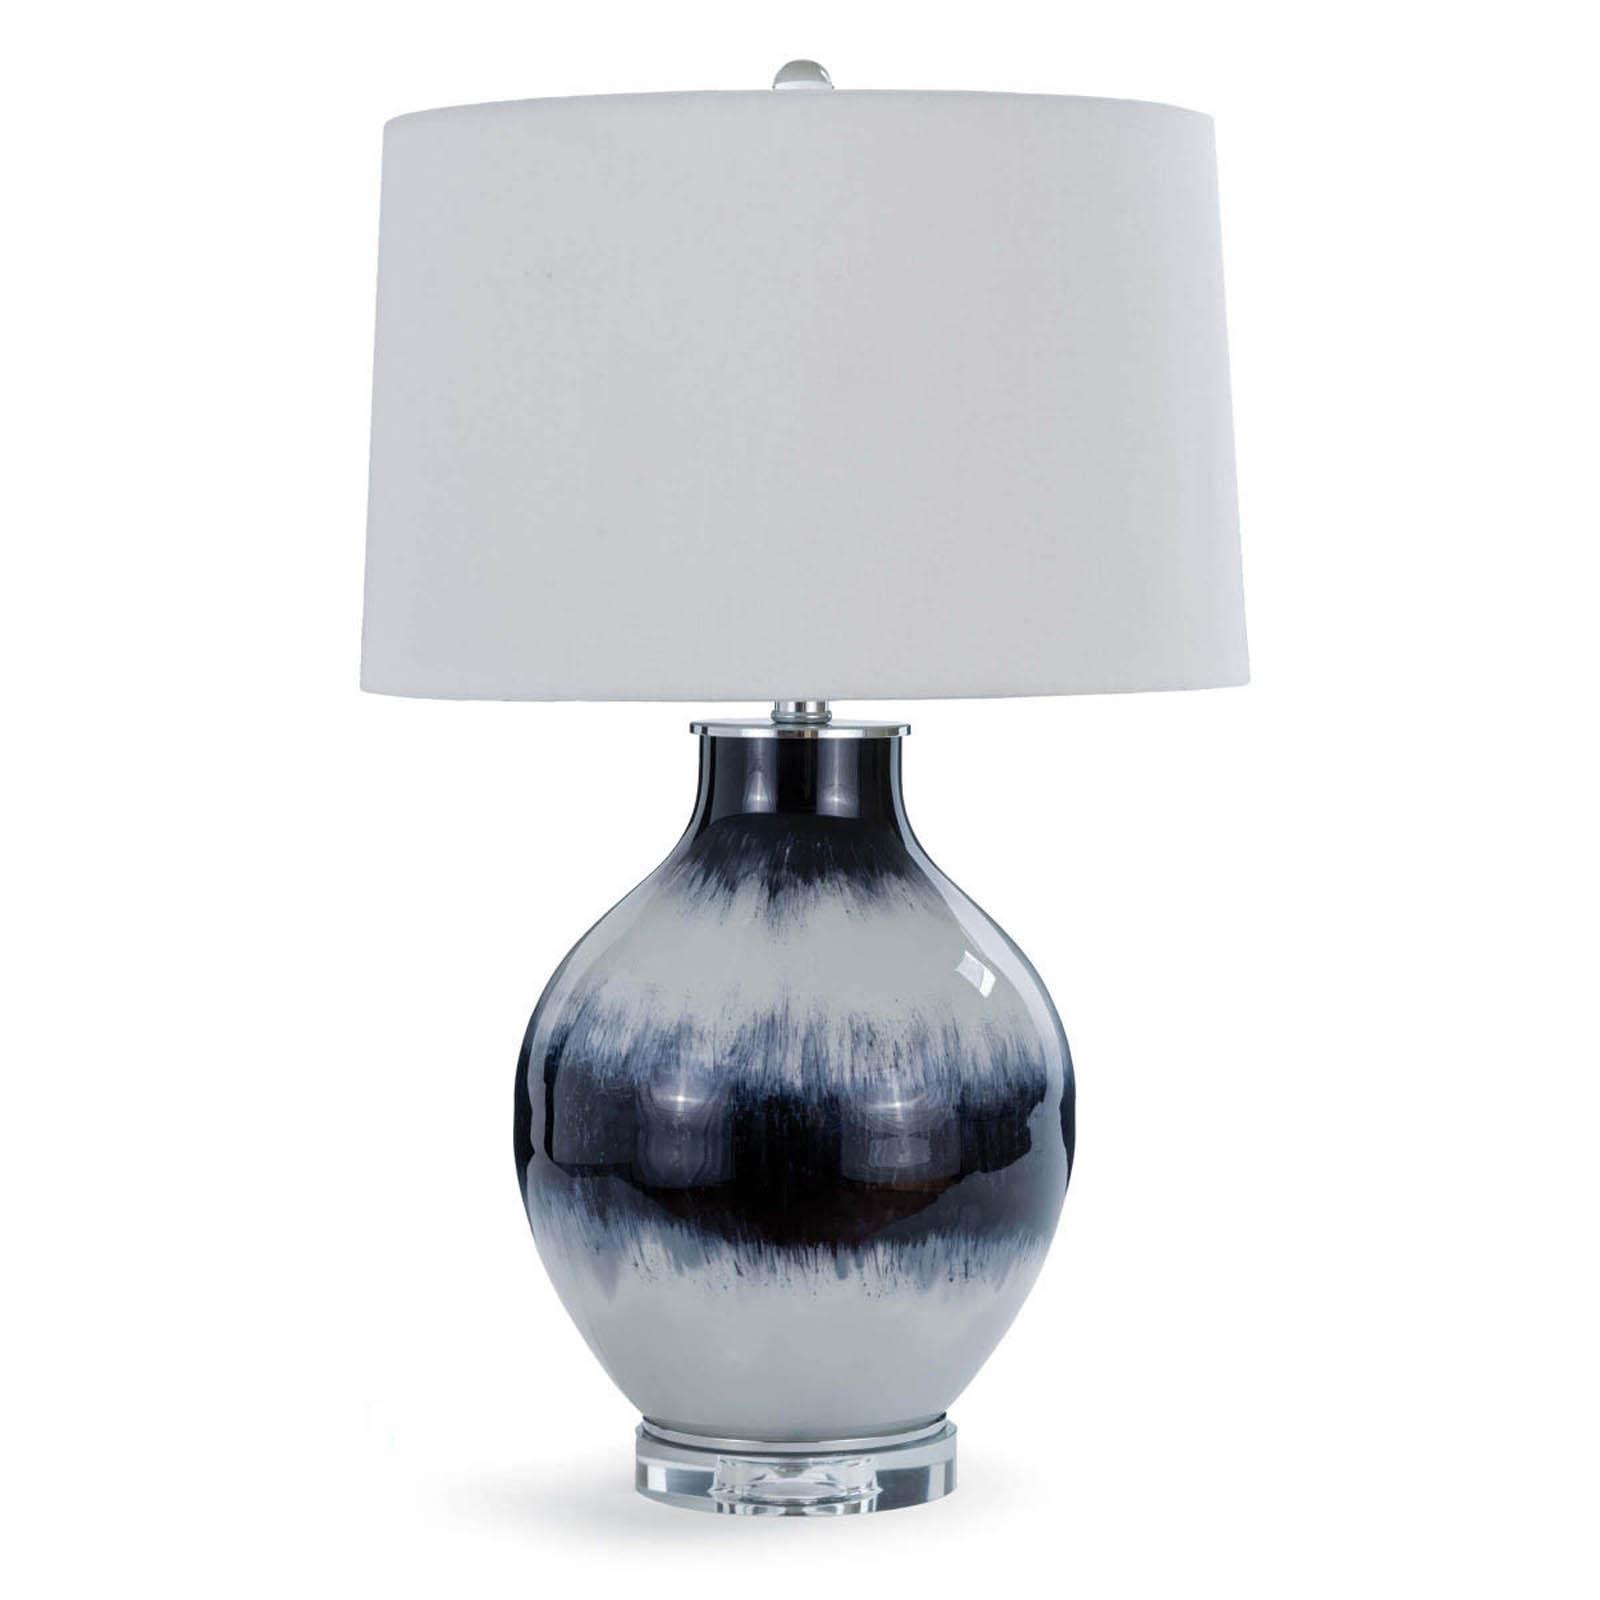 Indigo Glass Table Lamp | Regina Andrew